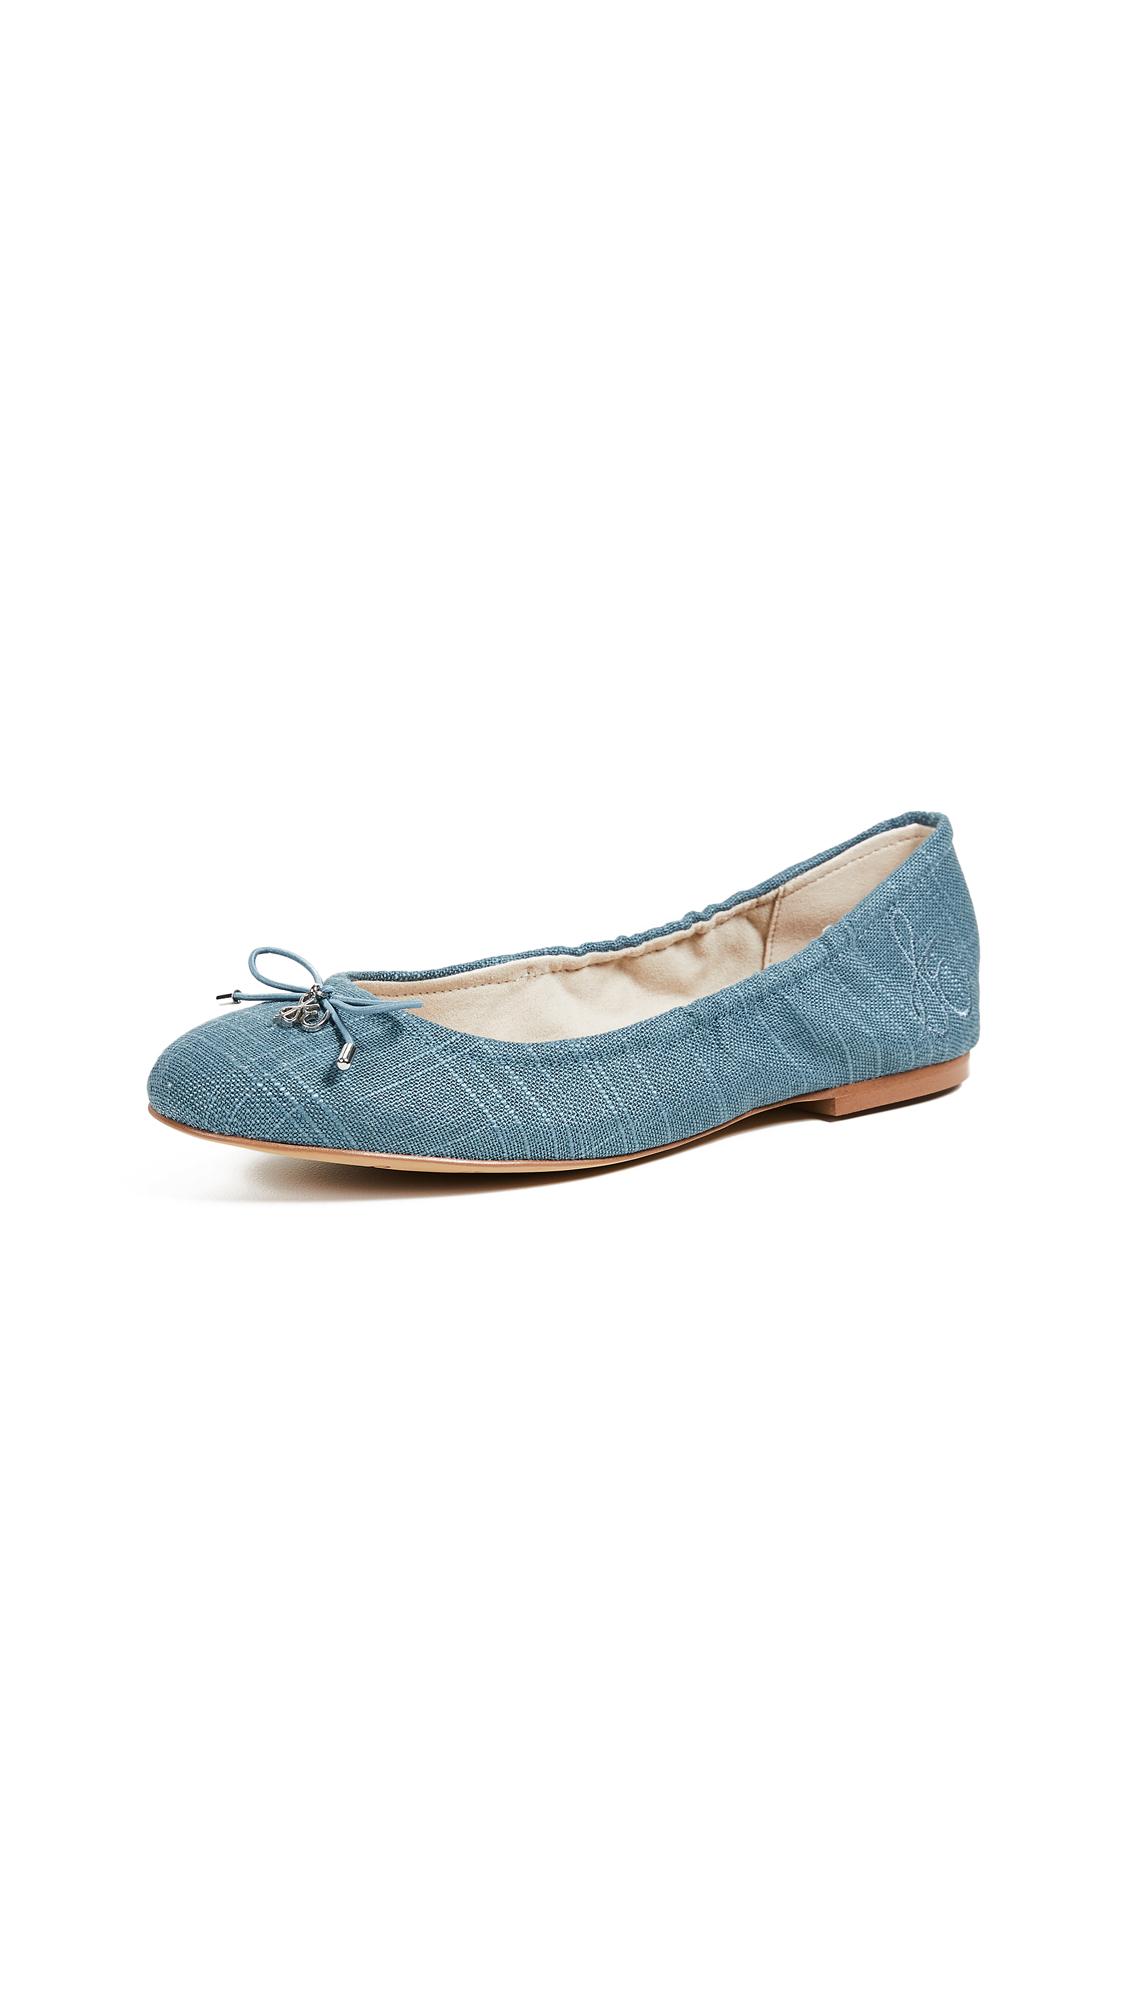 Sam Edelman Felicia Ballet Flats - Denim Blue